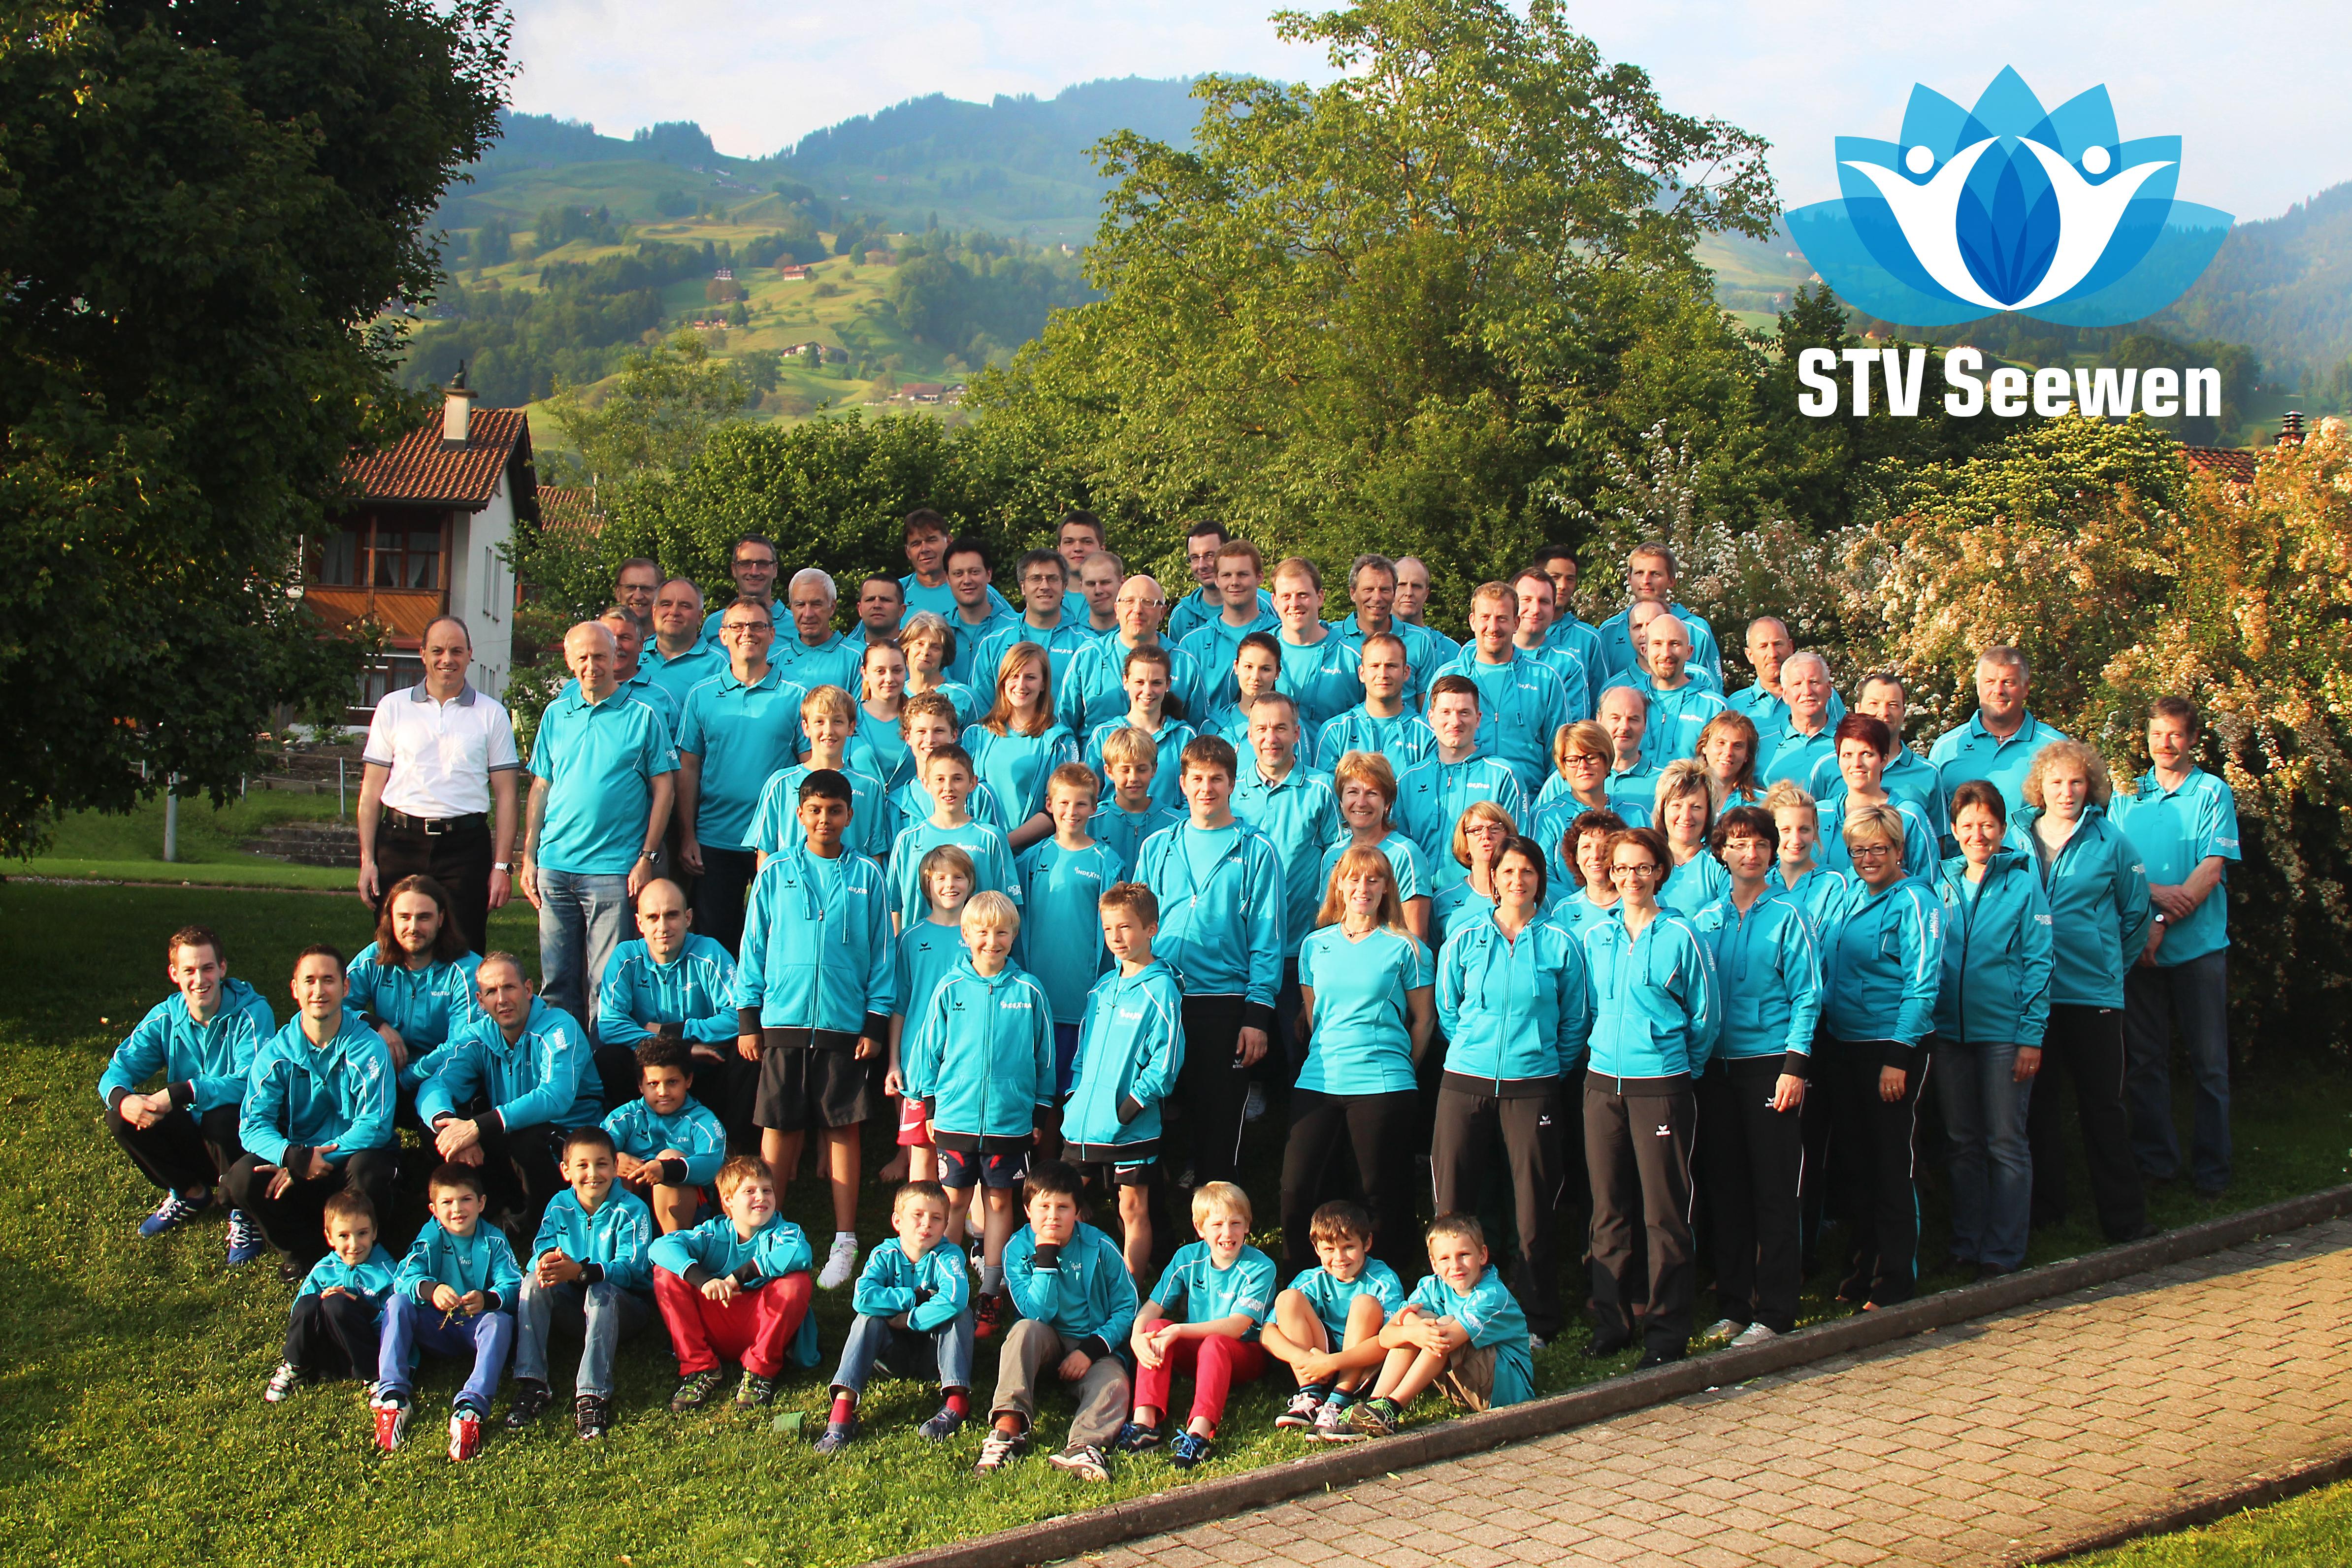 STV Seewen